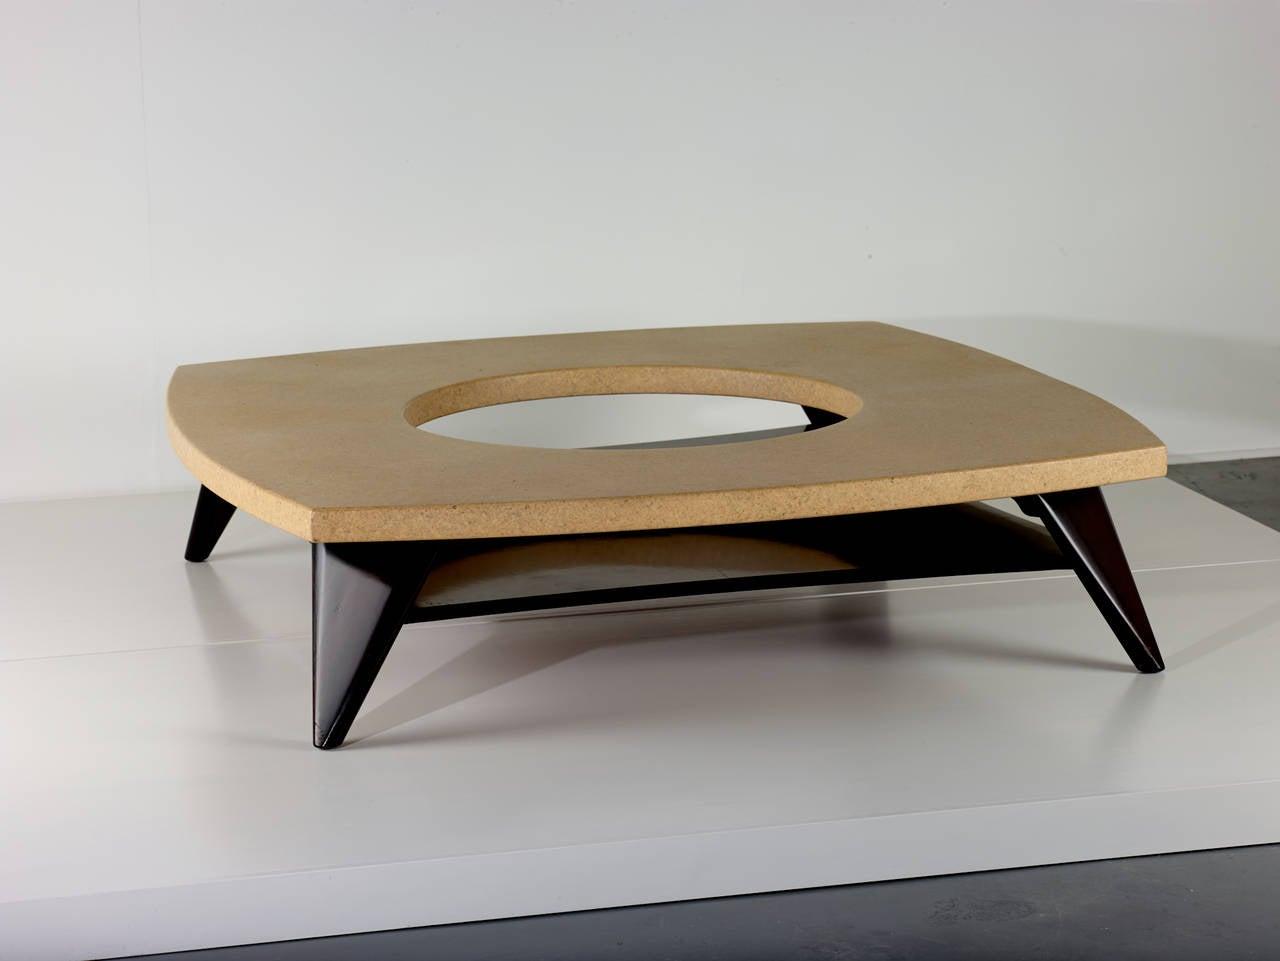 Paul Frankl.  Coffee table.  Johnson Furniture Company, USA, circa 1951. Lacquered cork, lacquered mahogany. Dimensions: 60 D x 14.25 H inches.  Rare lacquered cork coffee table by Paul Frankl.